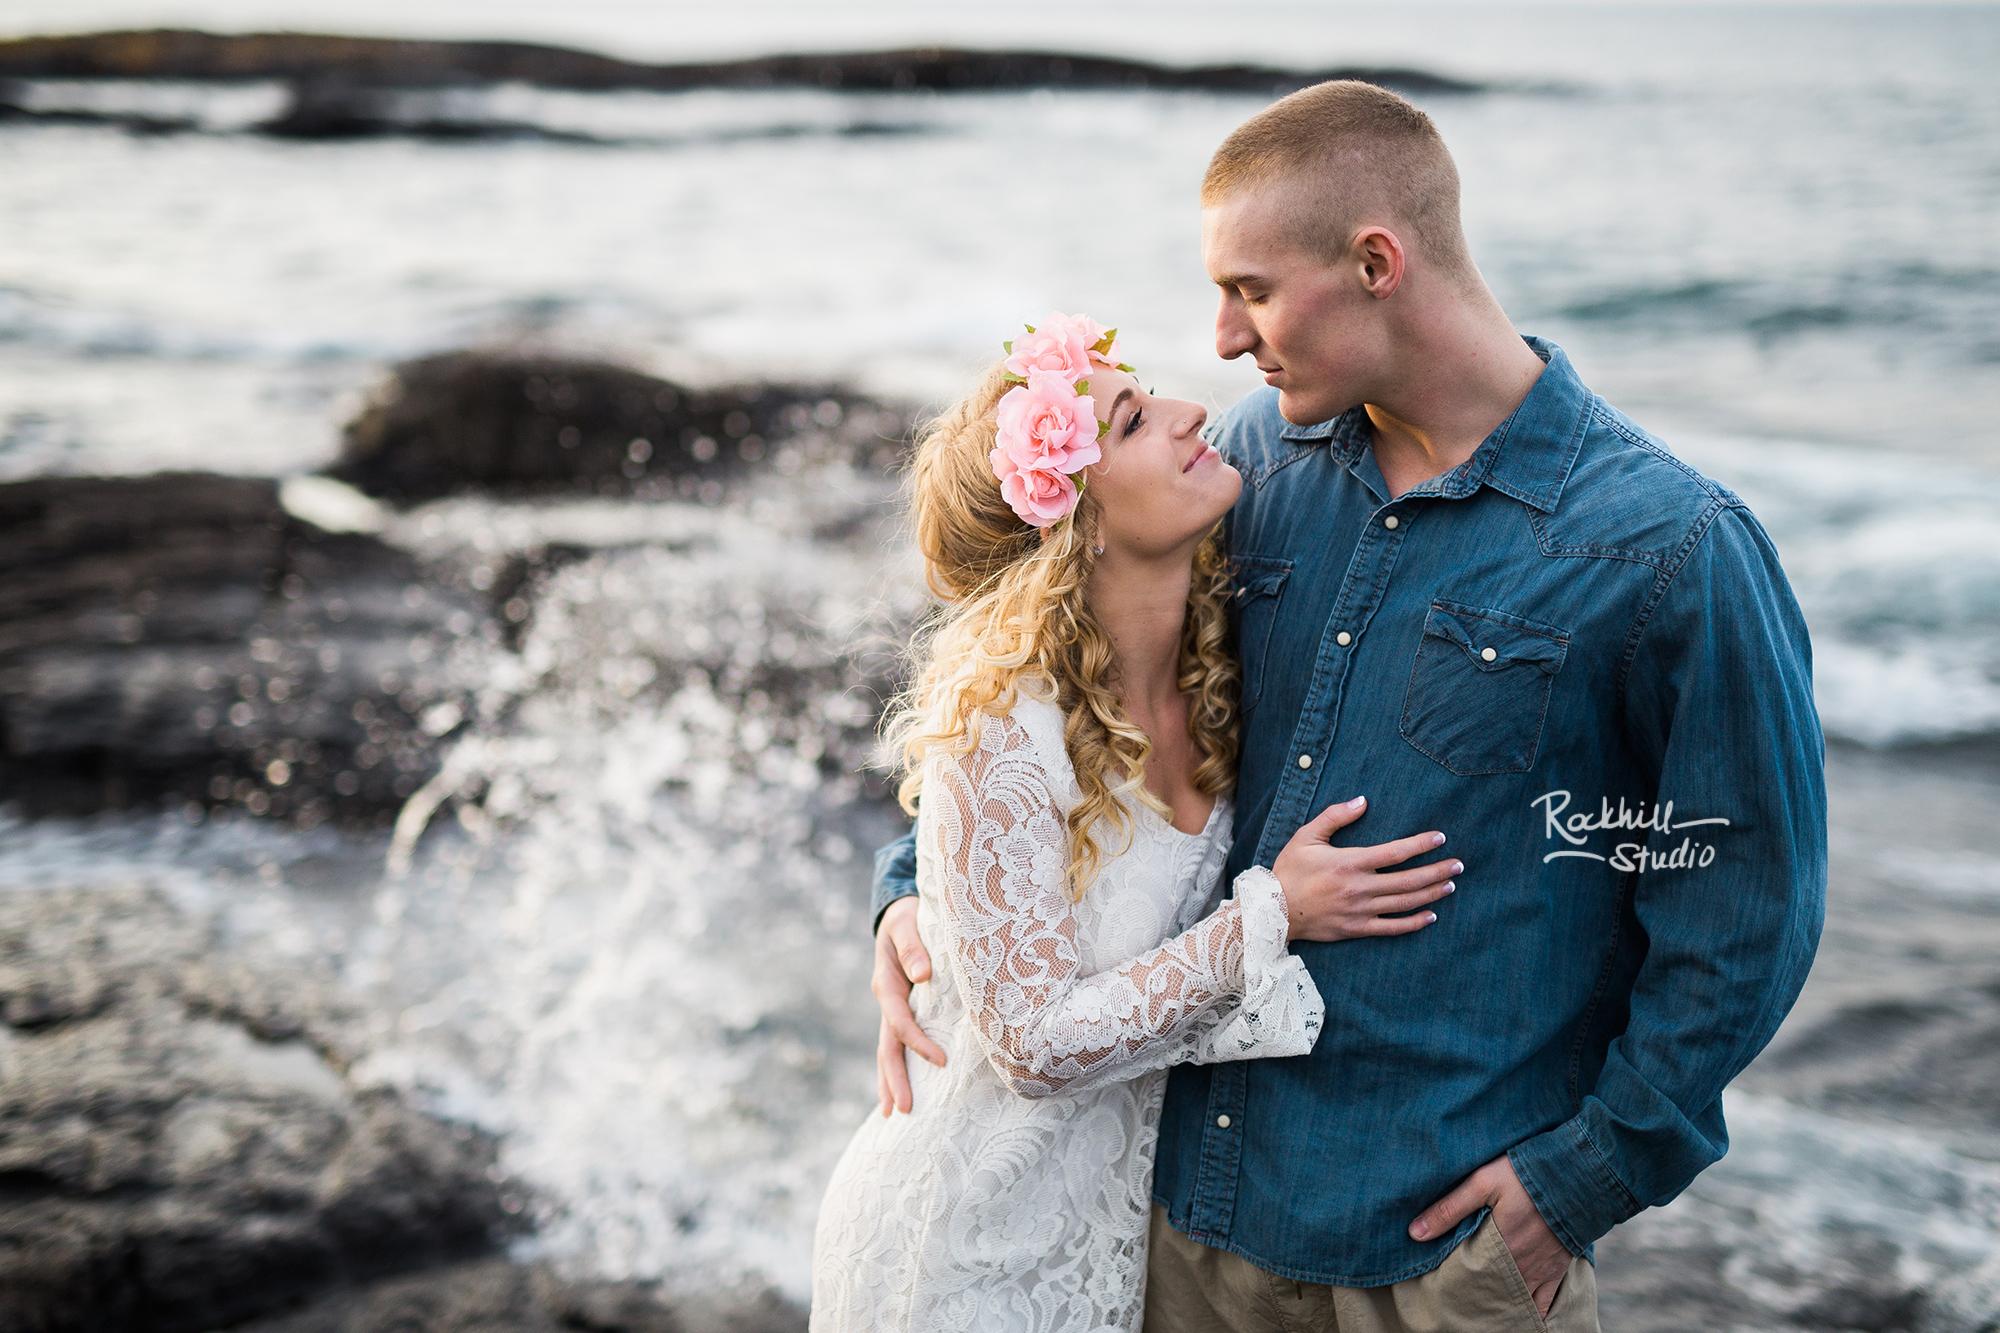 marquette-michigan-wedding-photography-rockhill-presque-isle-upper-peninsula-michigan-haley-41.jpg